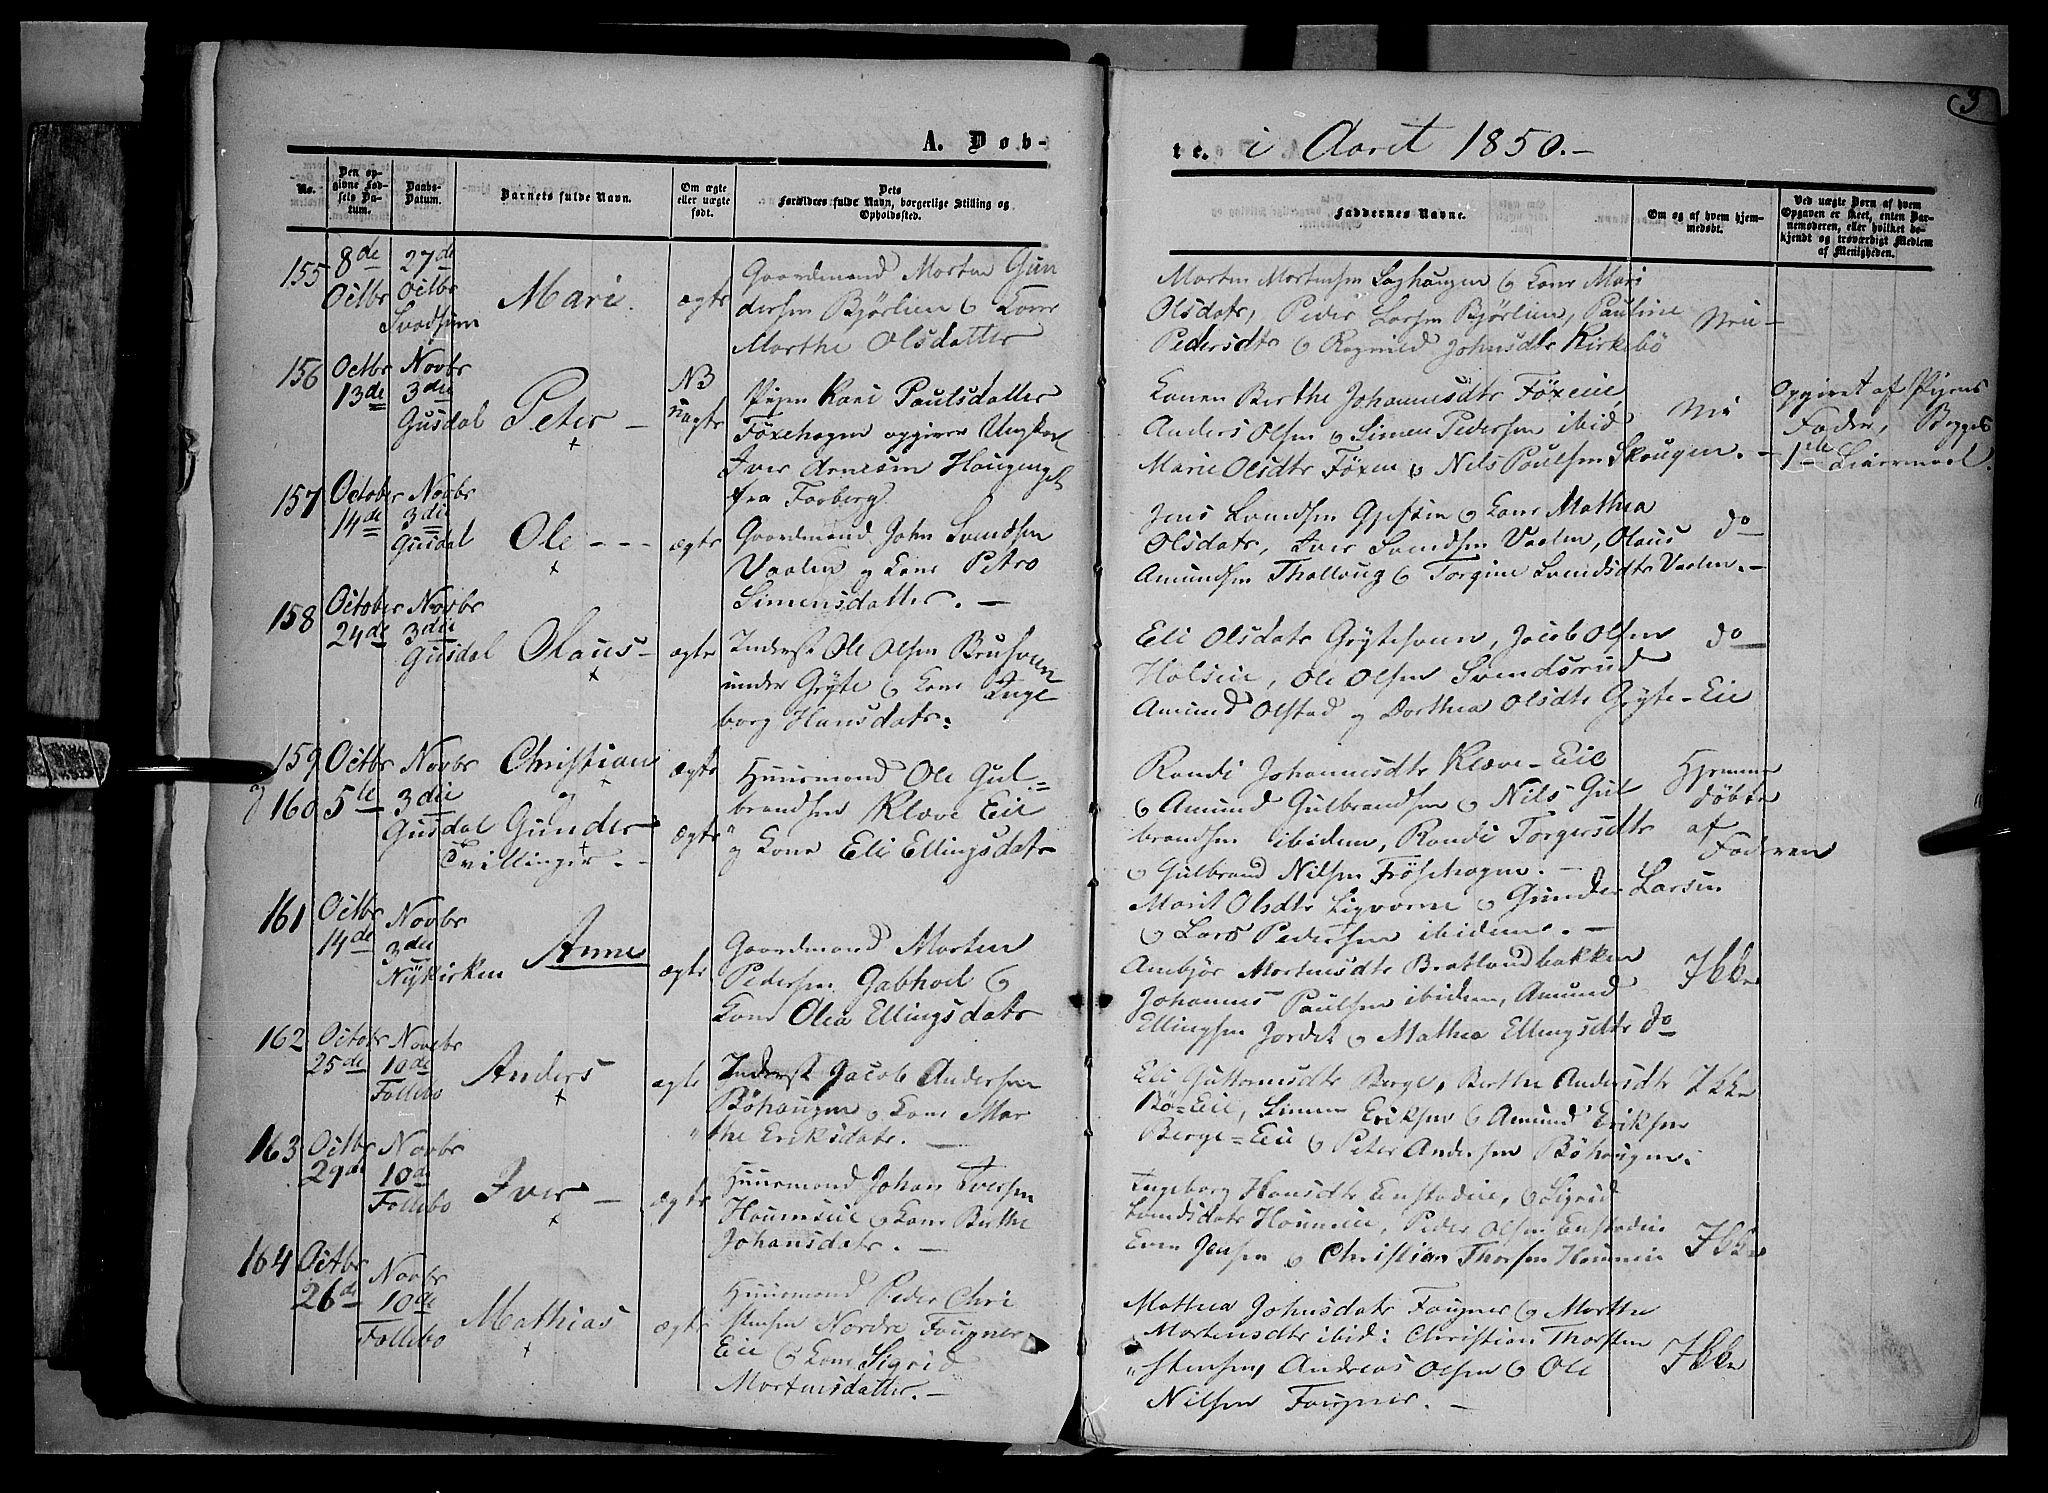 SAH, Gausdal prestekontor, Ministerialbok nr. 8, 1850-1861, s. 3